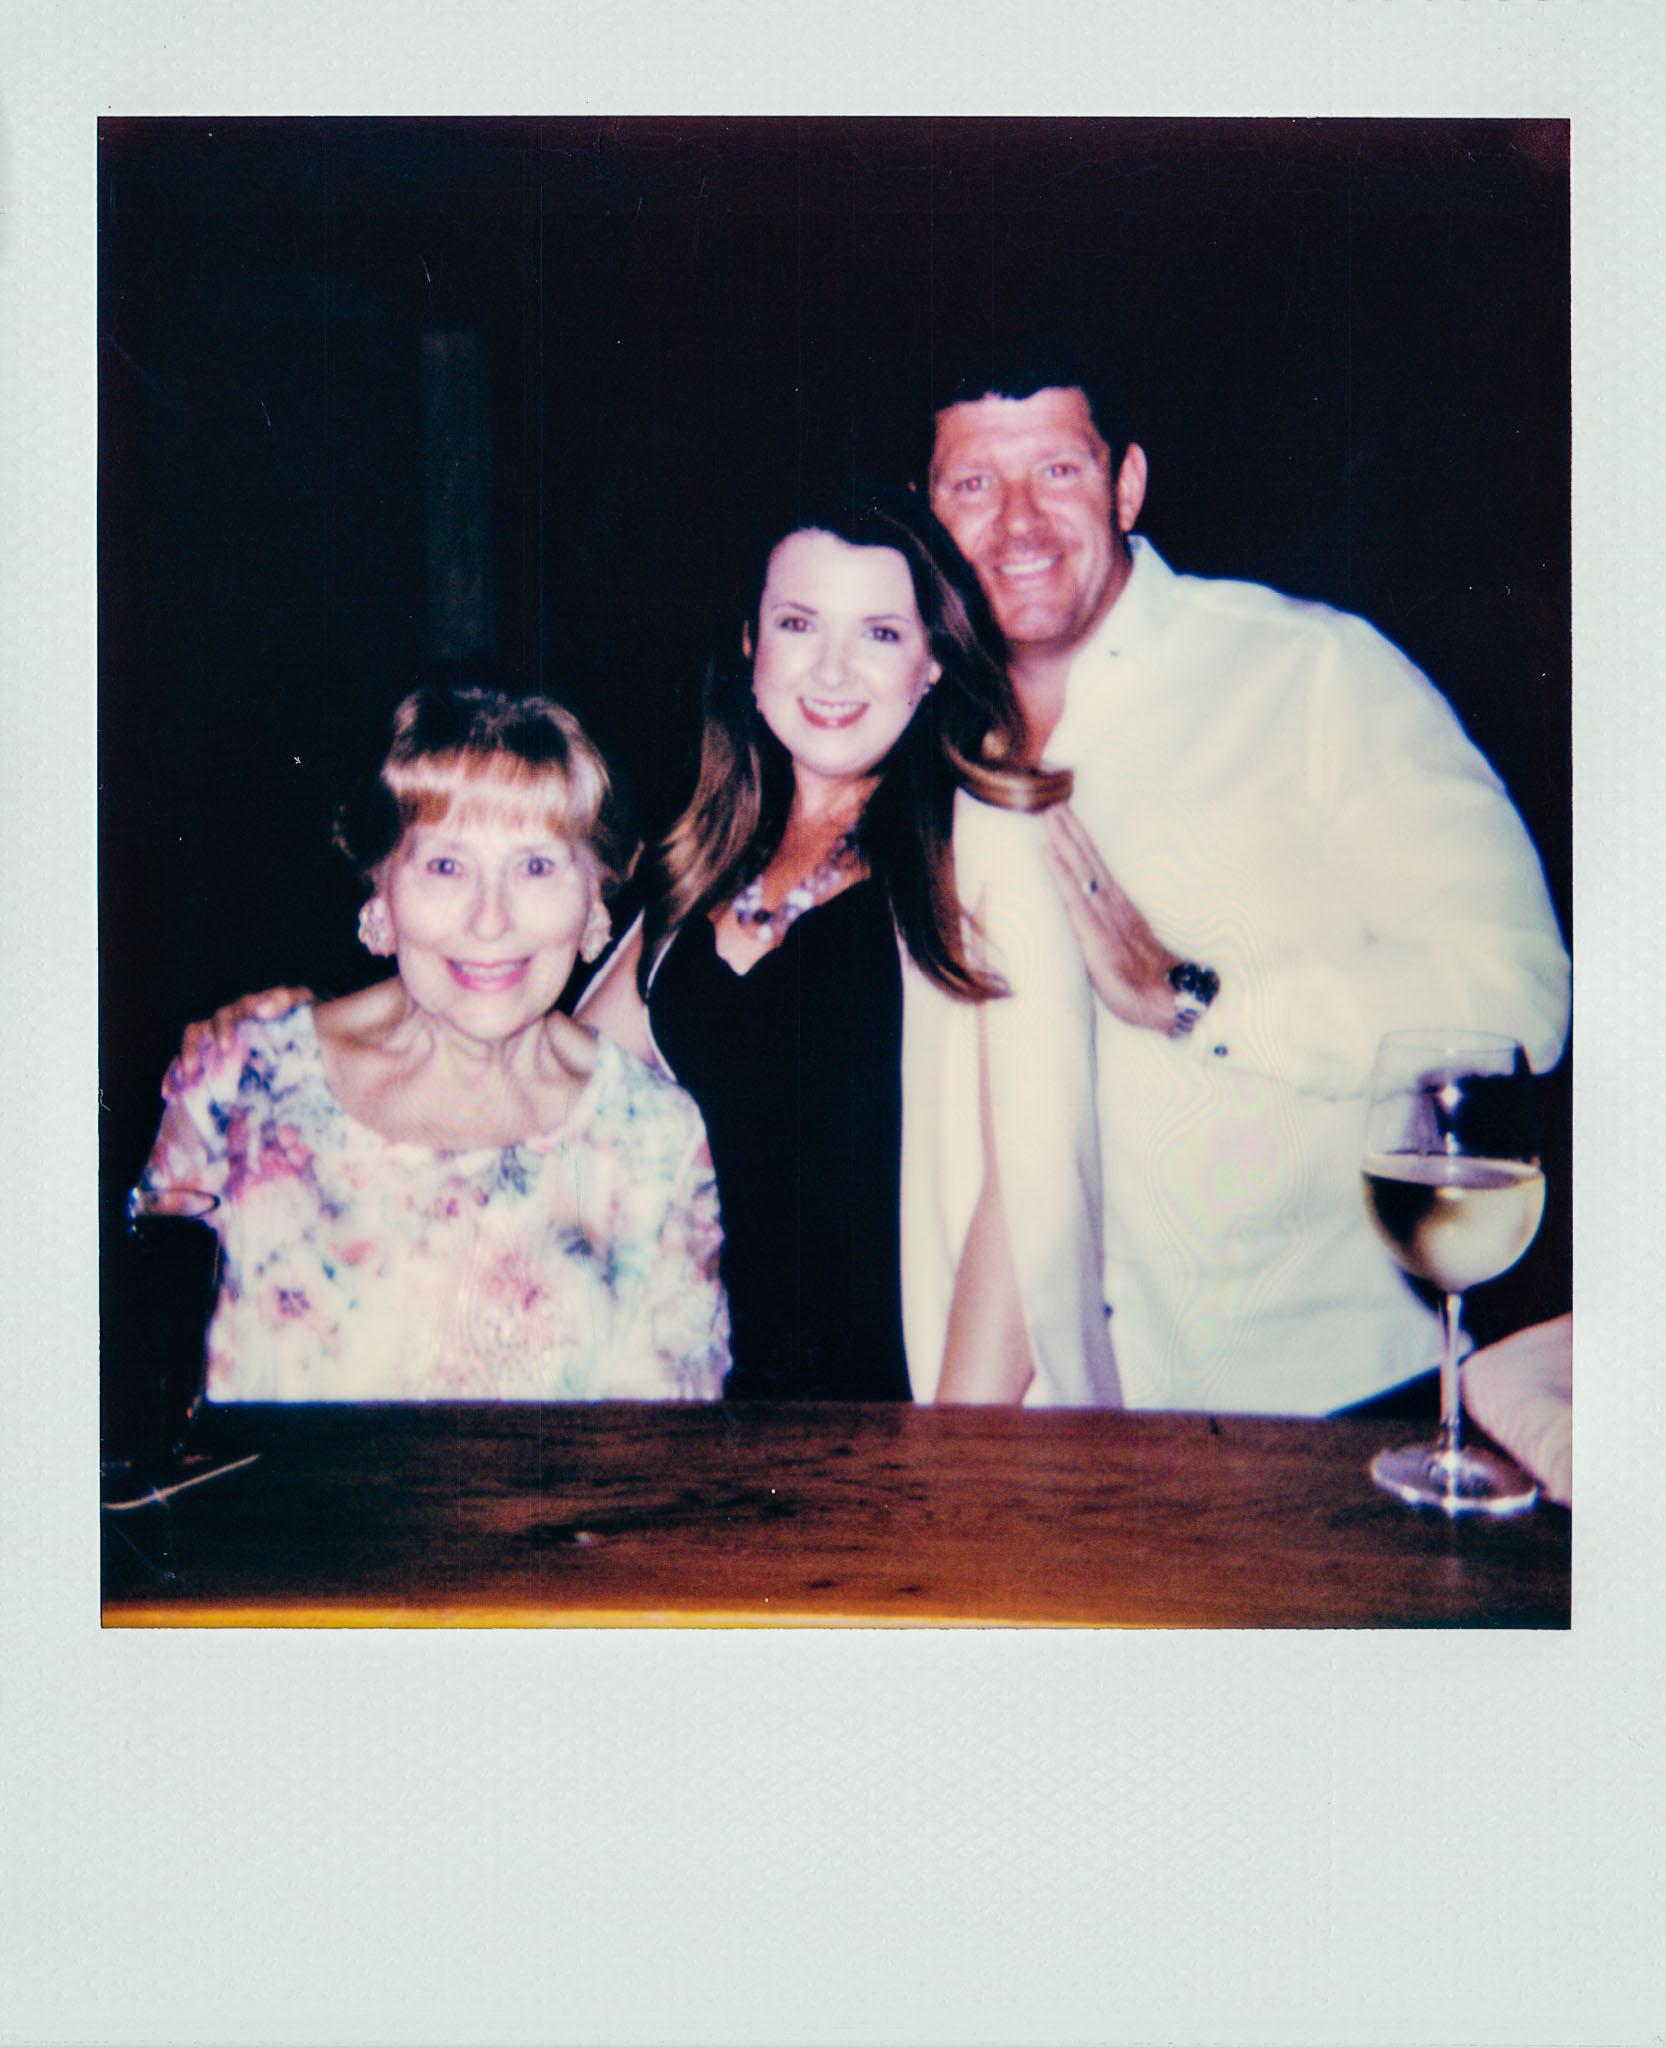 Linda-Updike-Wallys-Polaroid.jpg